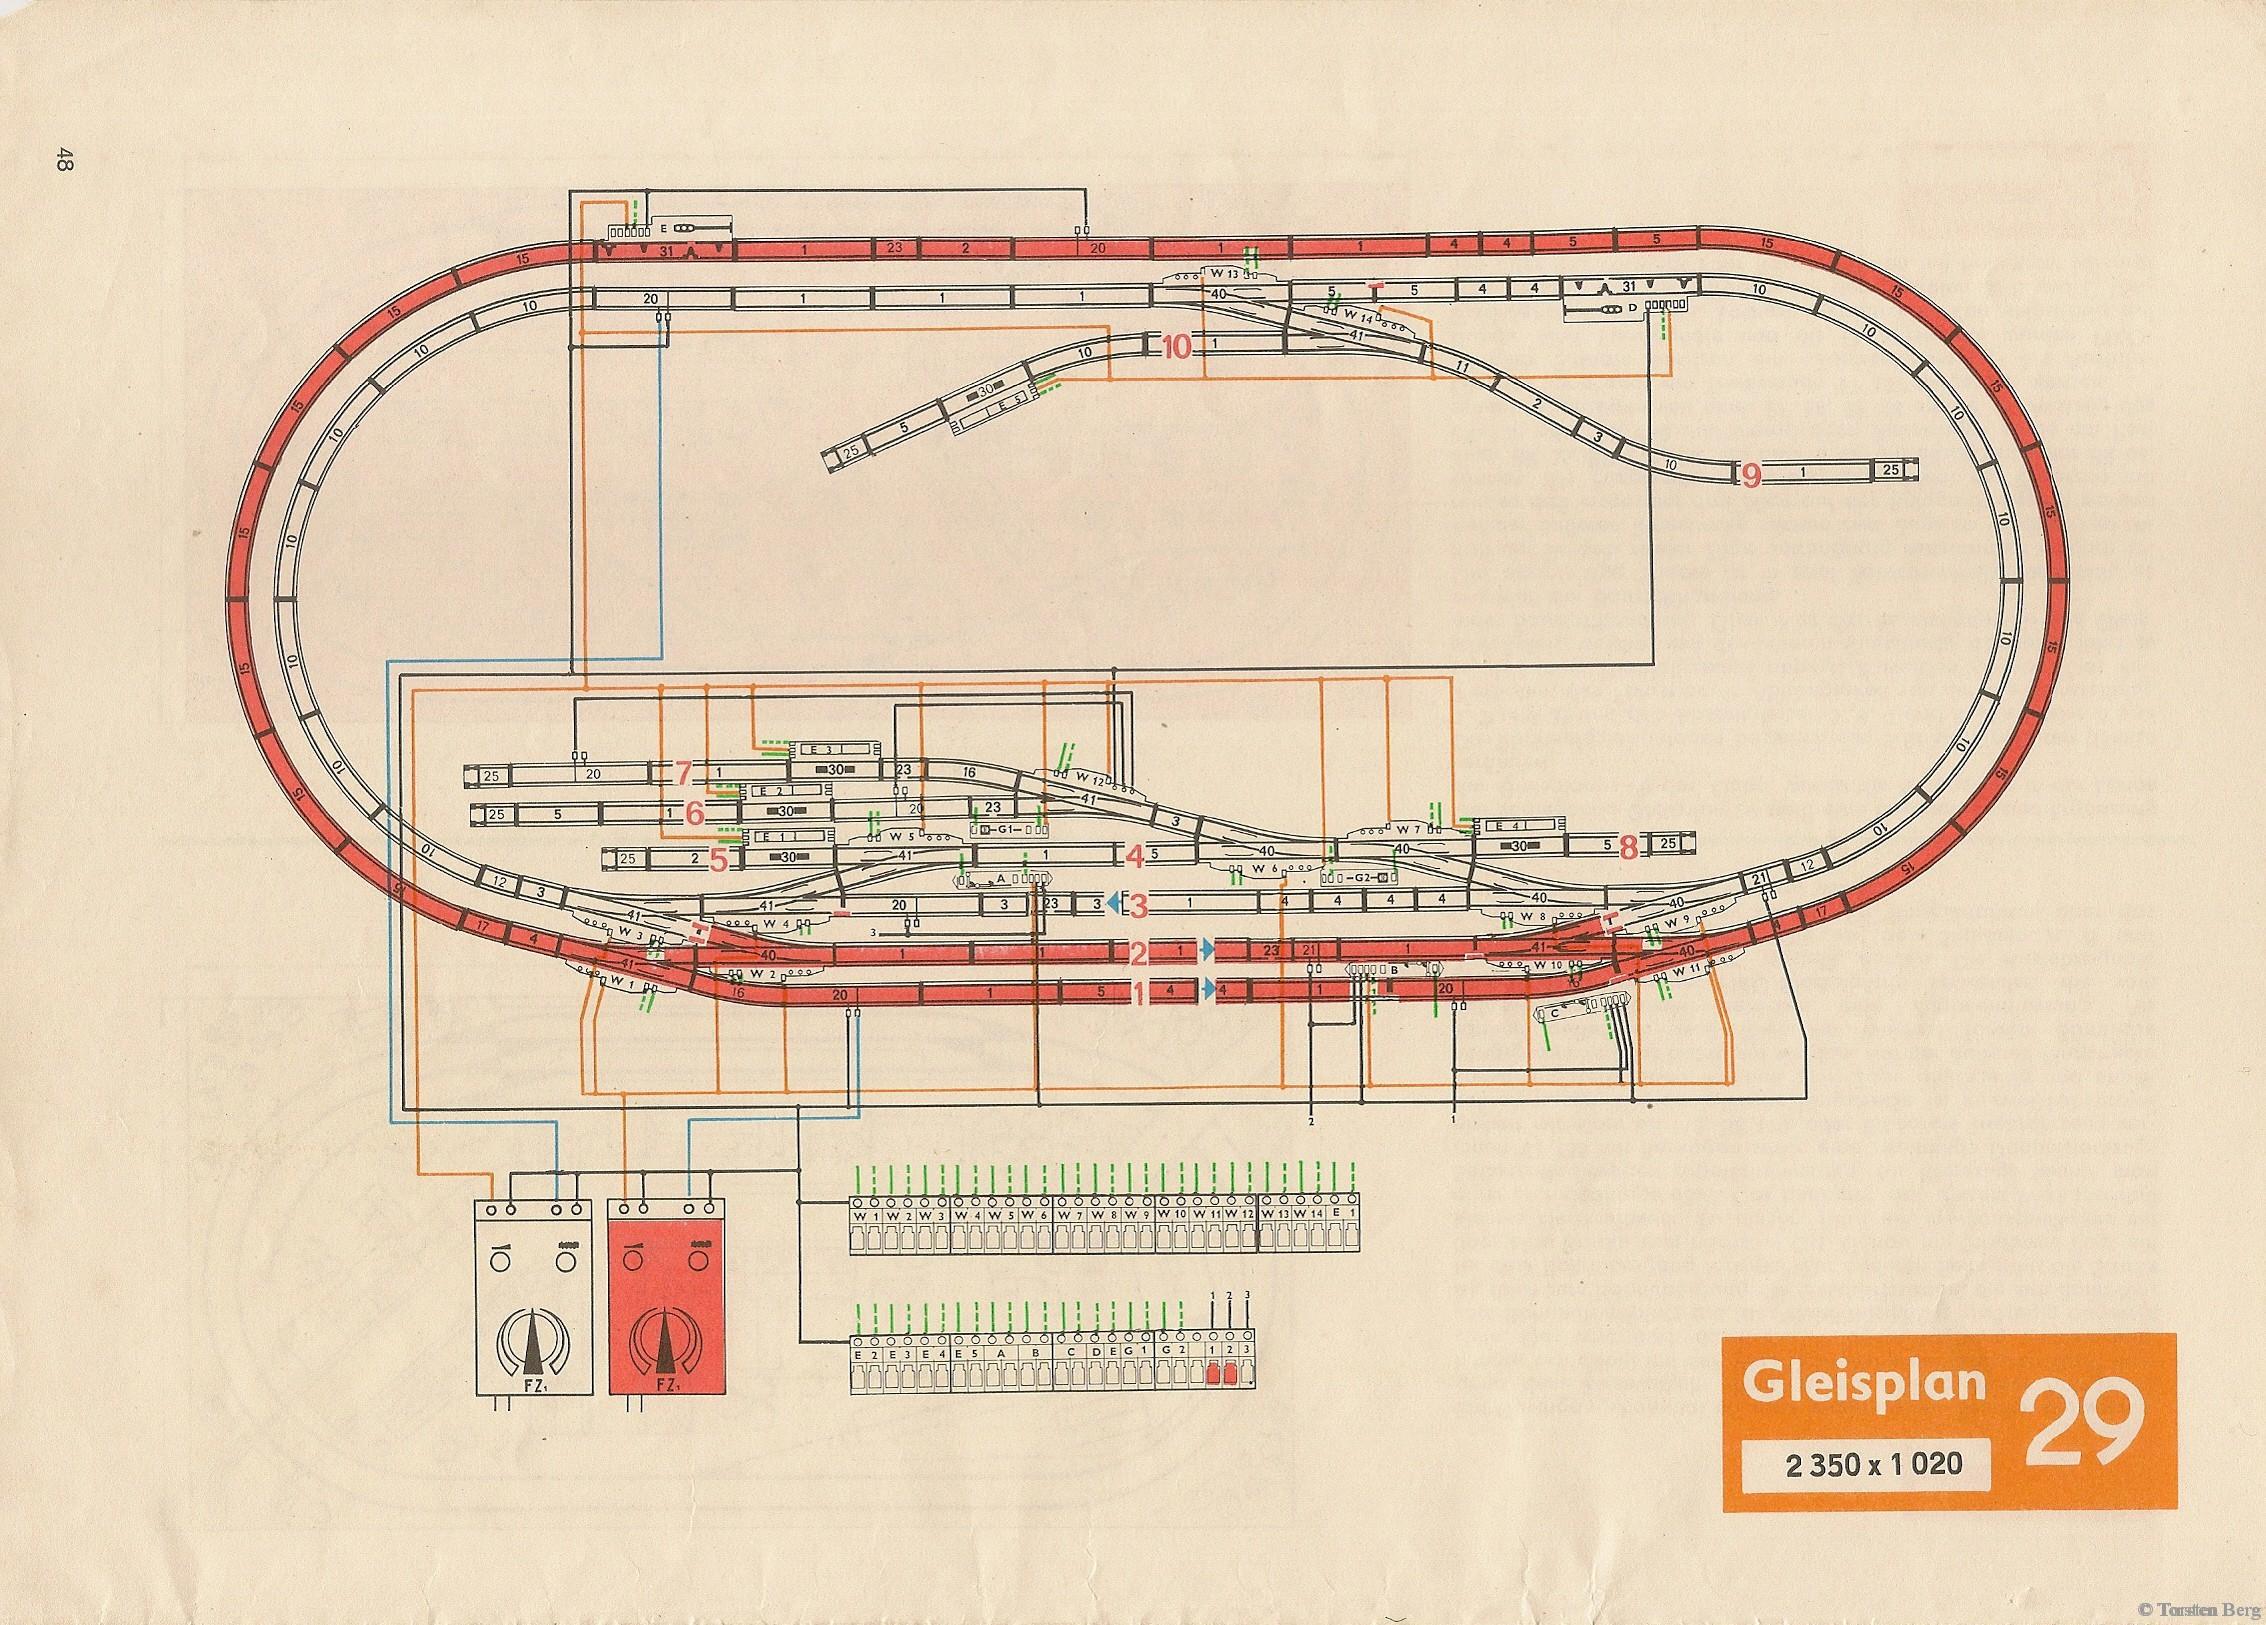 49 VEB Kombinat PIKO Standardgleis-Gleisplan 29